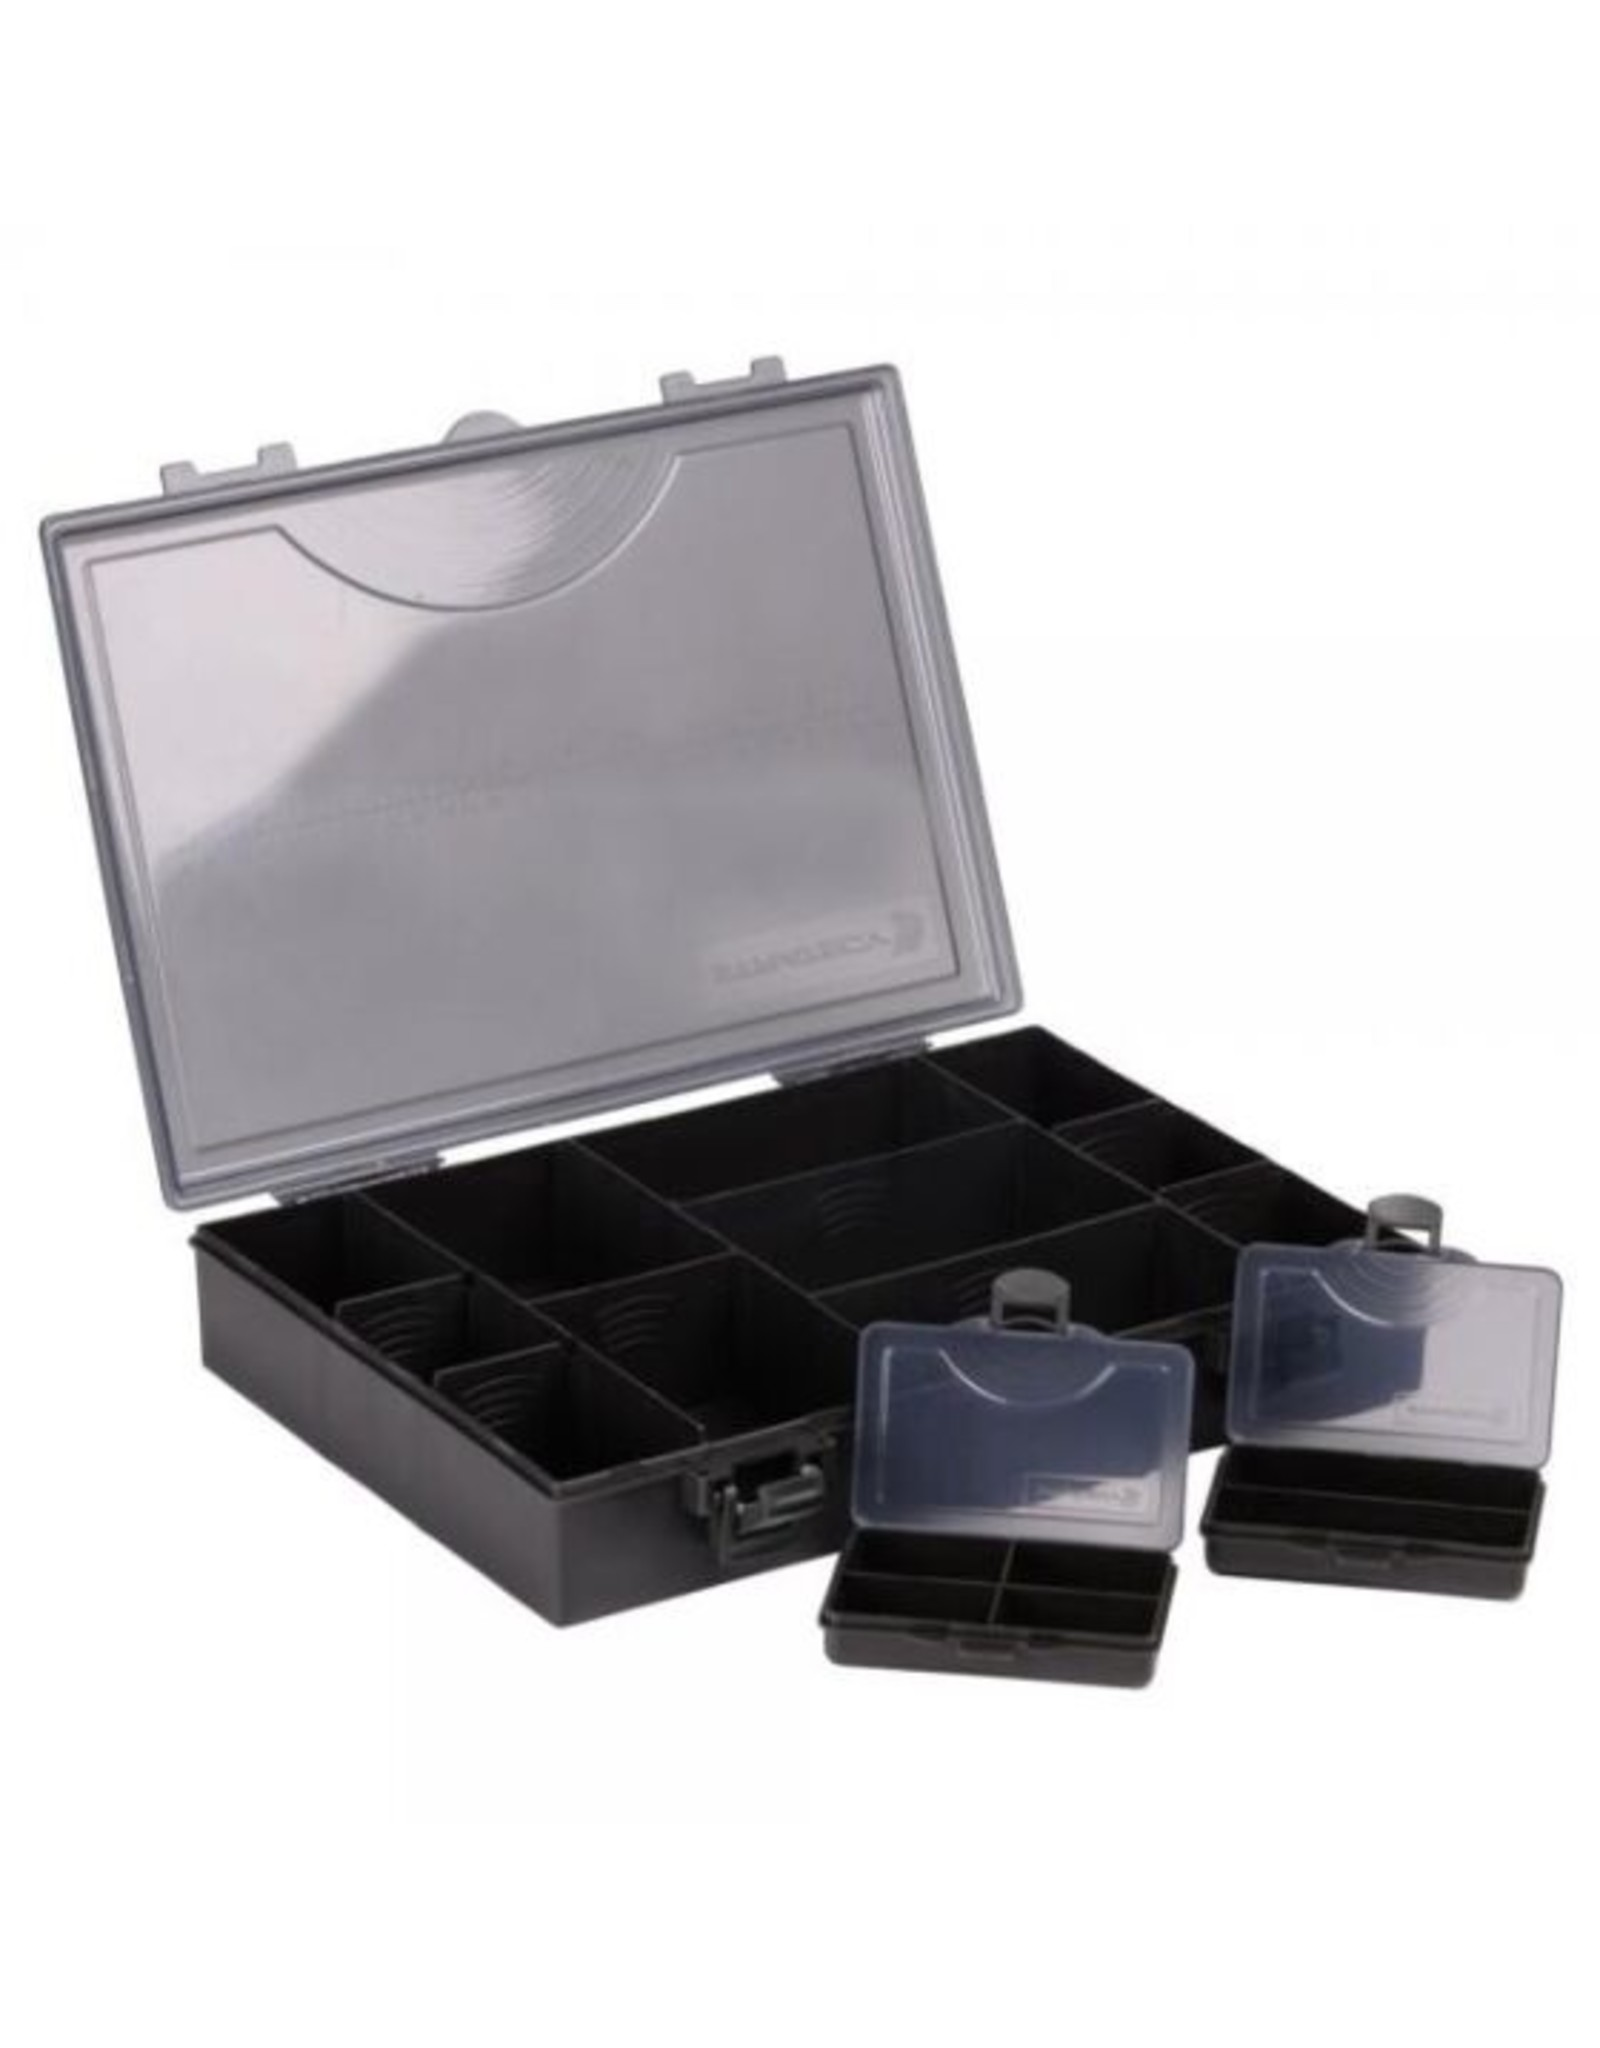 STRTG Tackle Box M & S